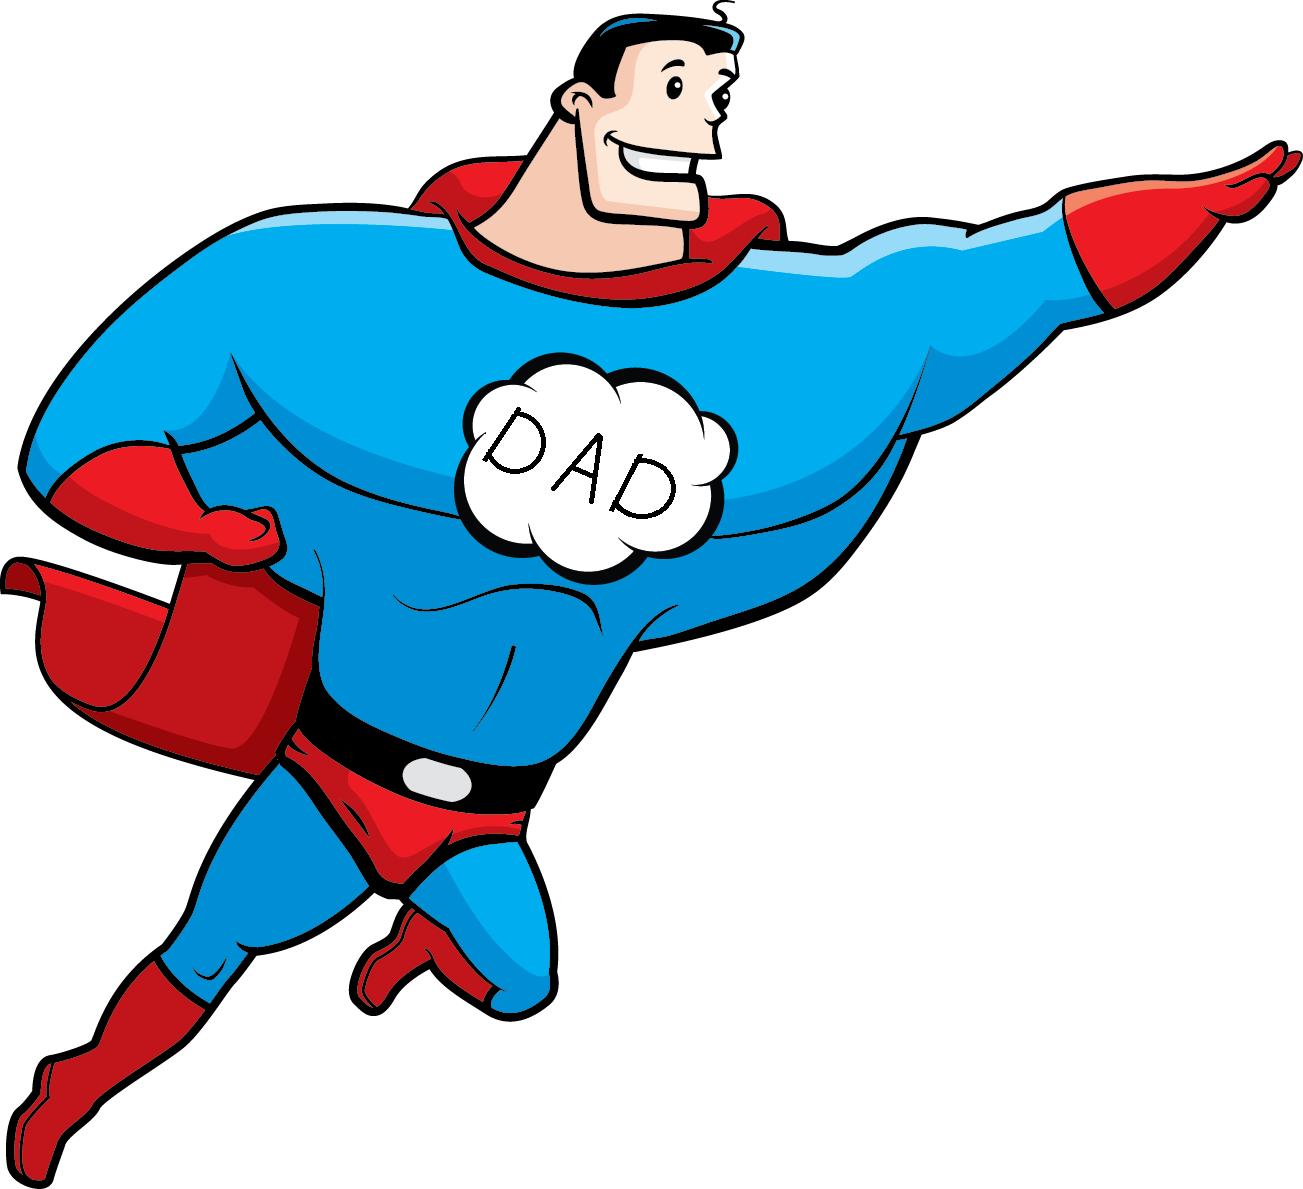 1303x1189 Essay My Dad Narmin Mustafayeva Essay My Hero Ccc Baku My Parents